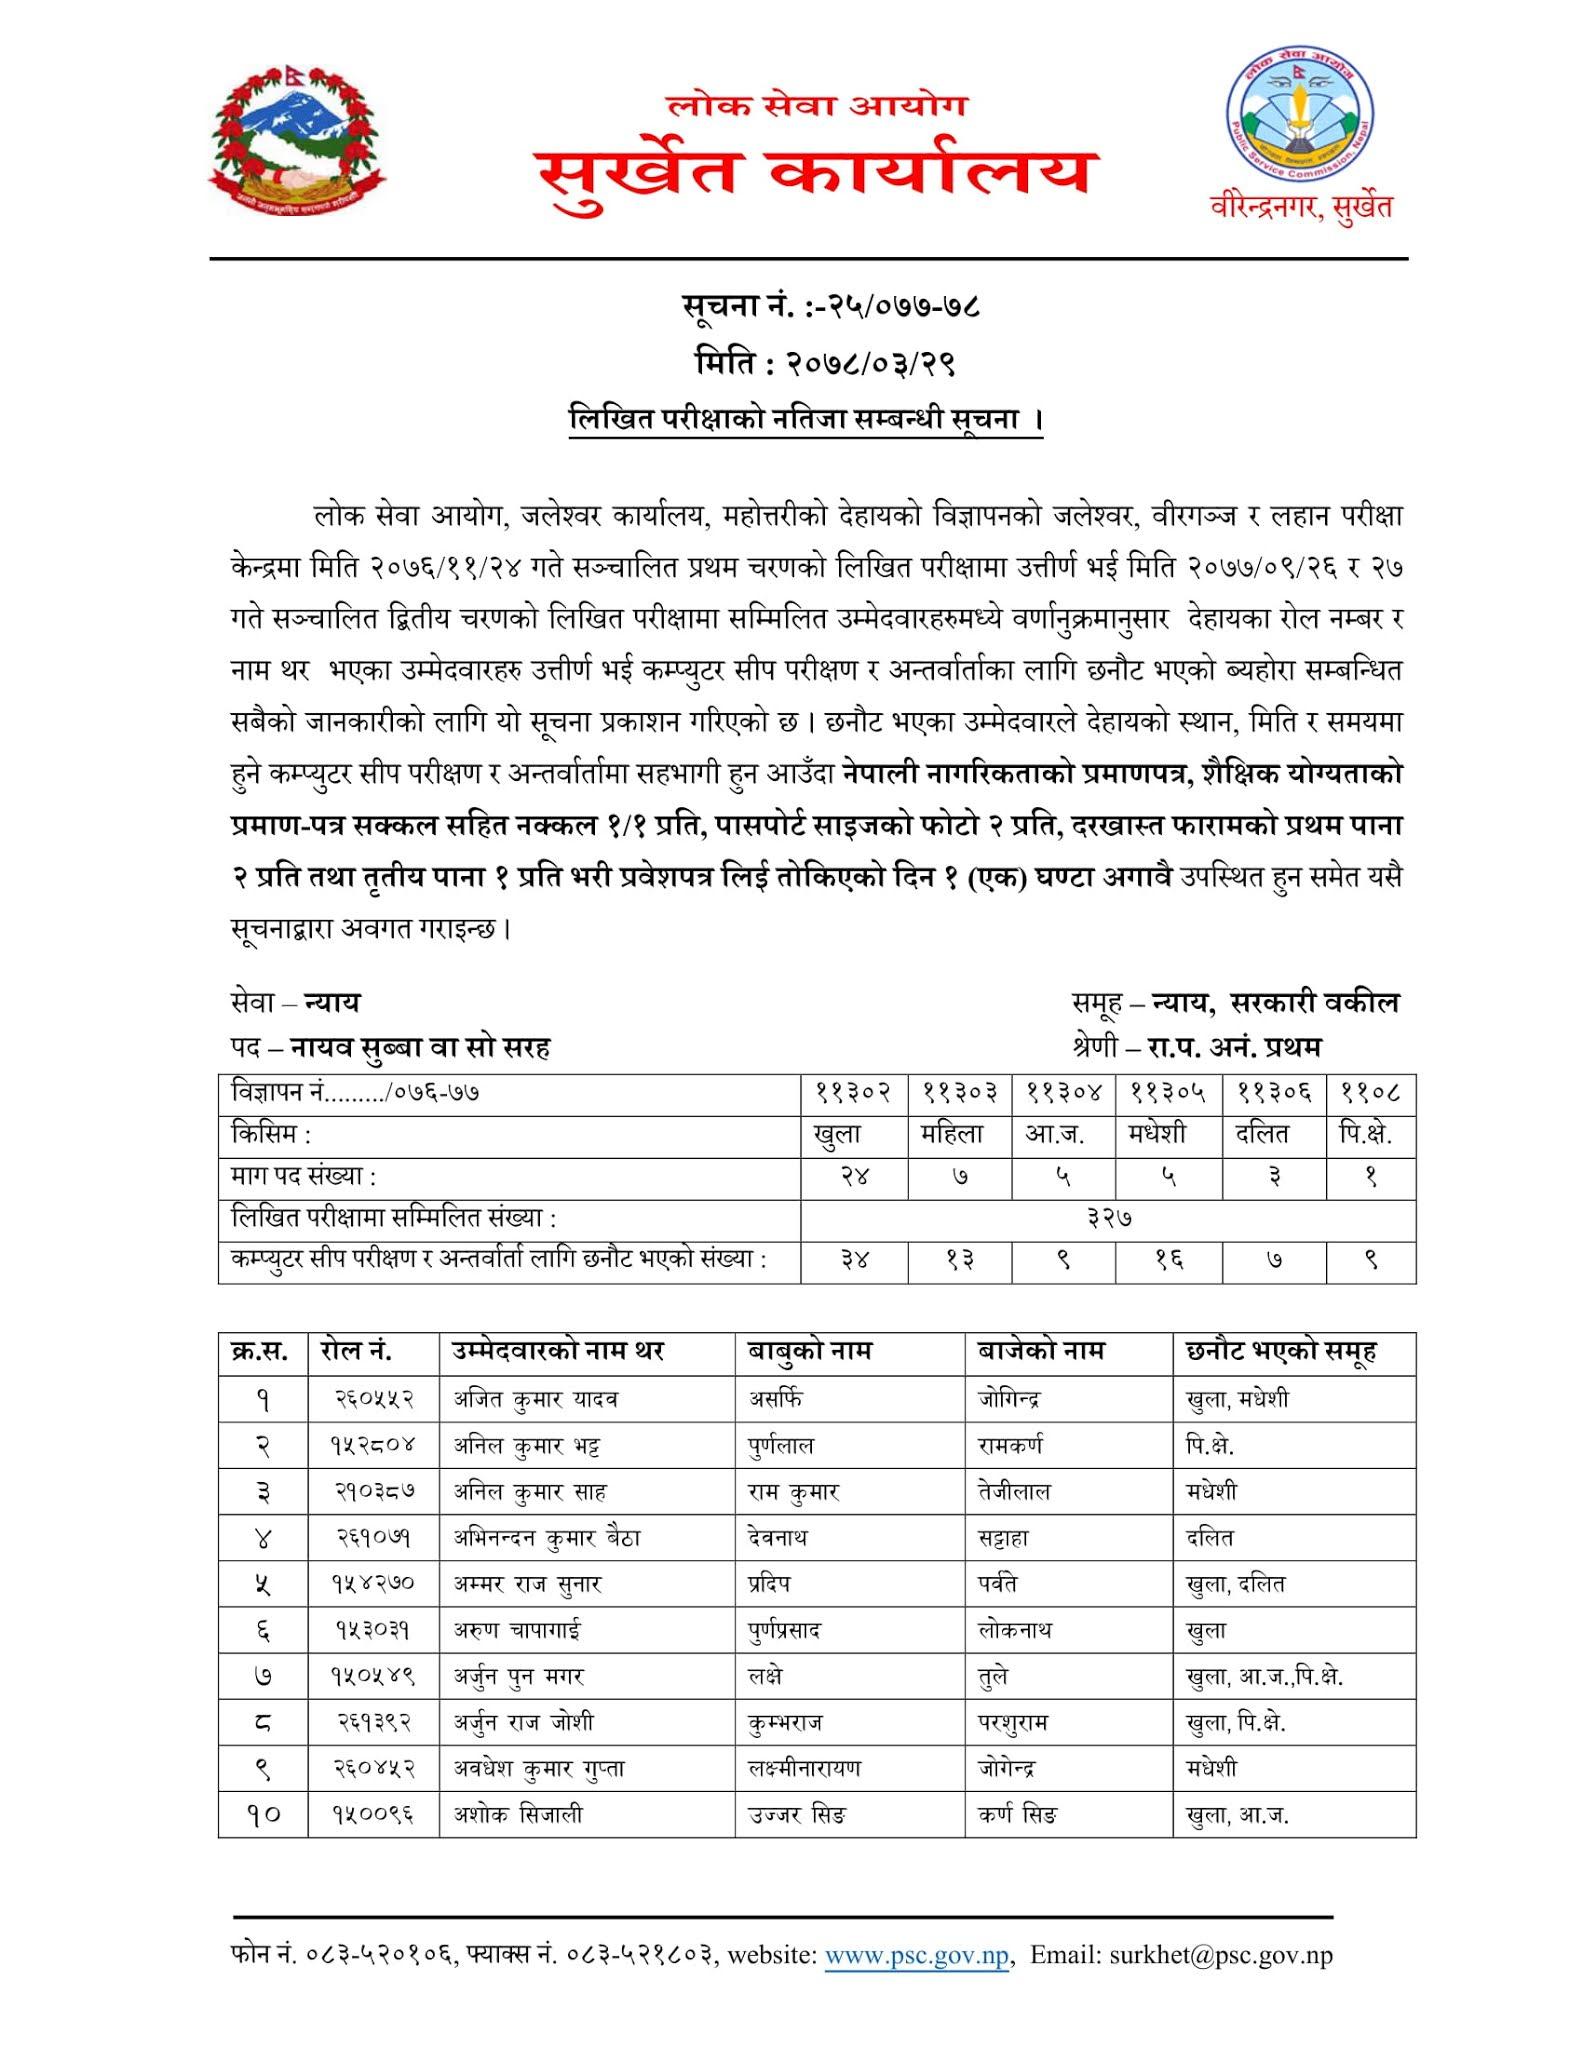 Jaleshwor Lok Sewa Aayog Written Exam Result & Exam Schedule of NASU Justice, Law and Public Prosecutor published by Surkhet Lok Sewa Aayog